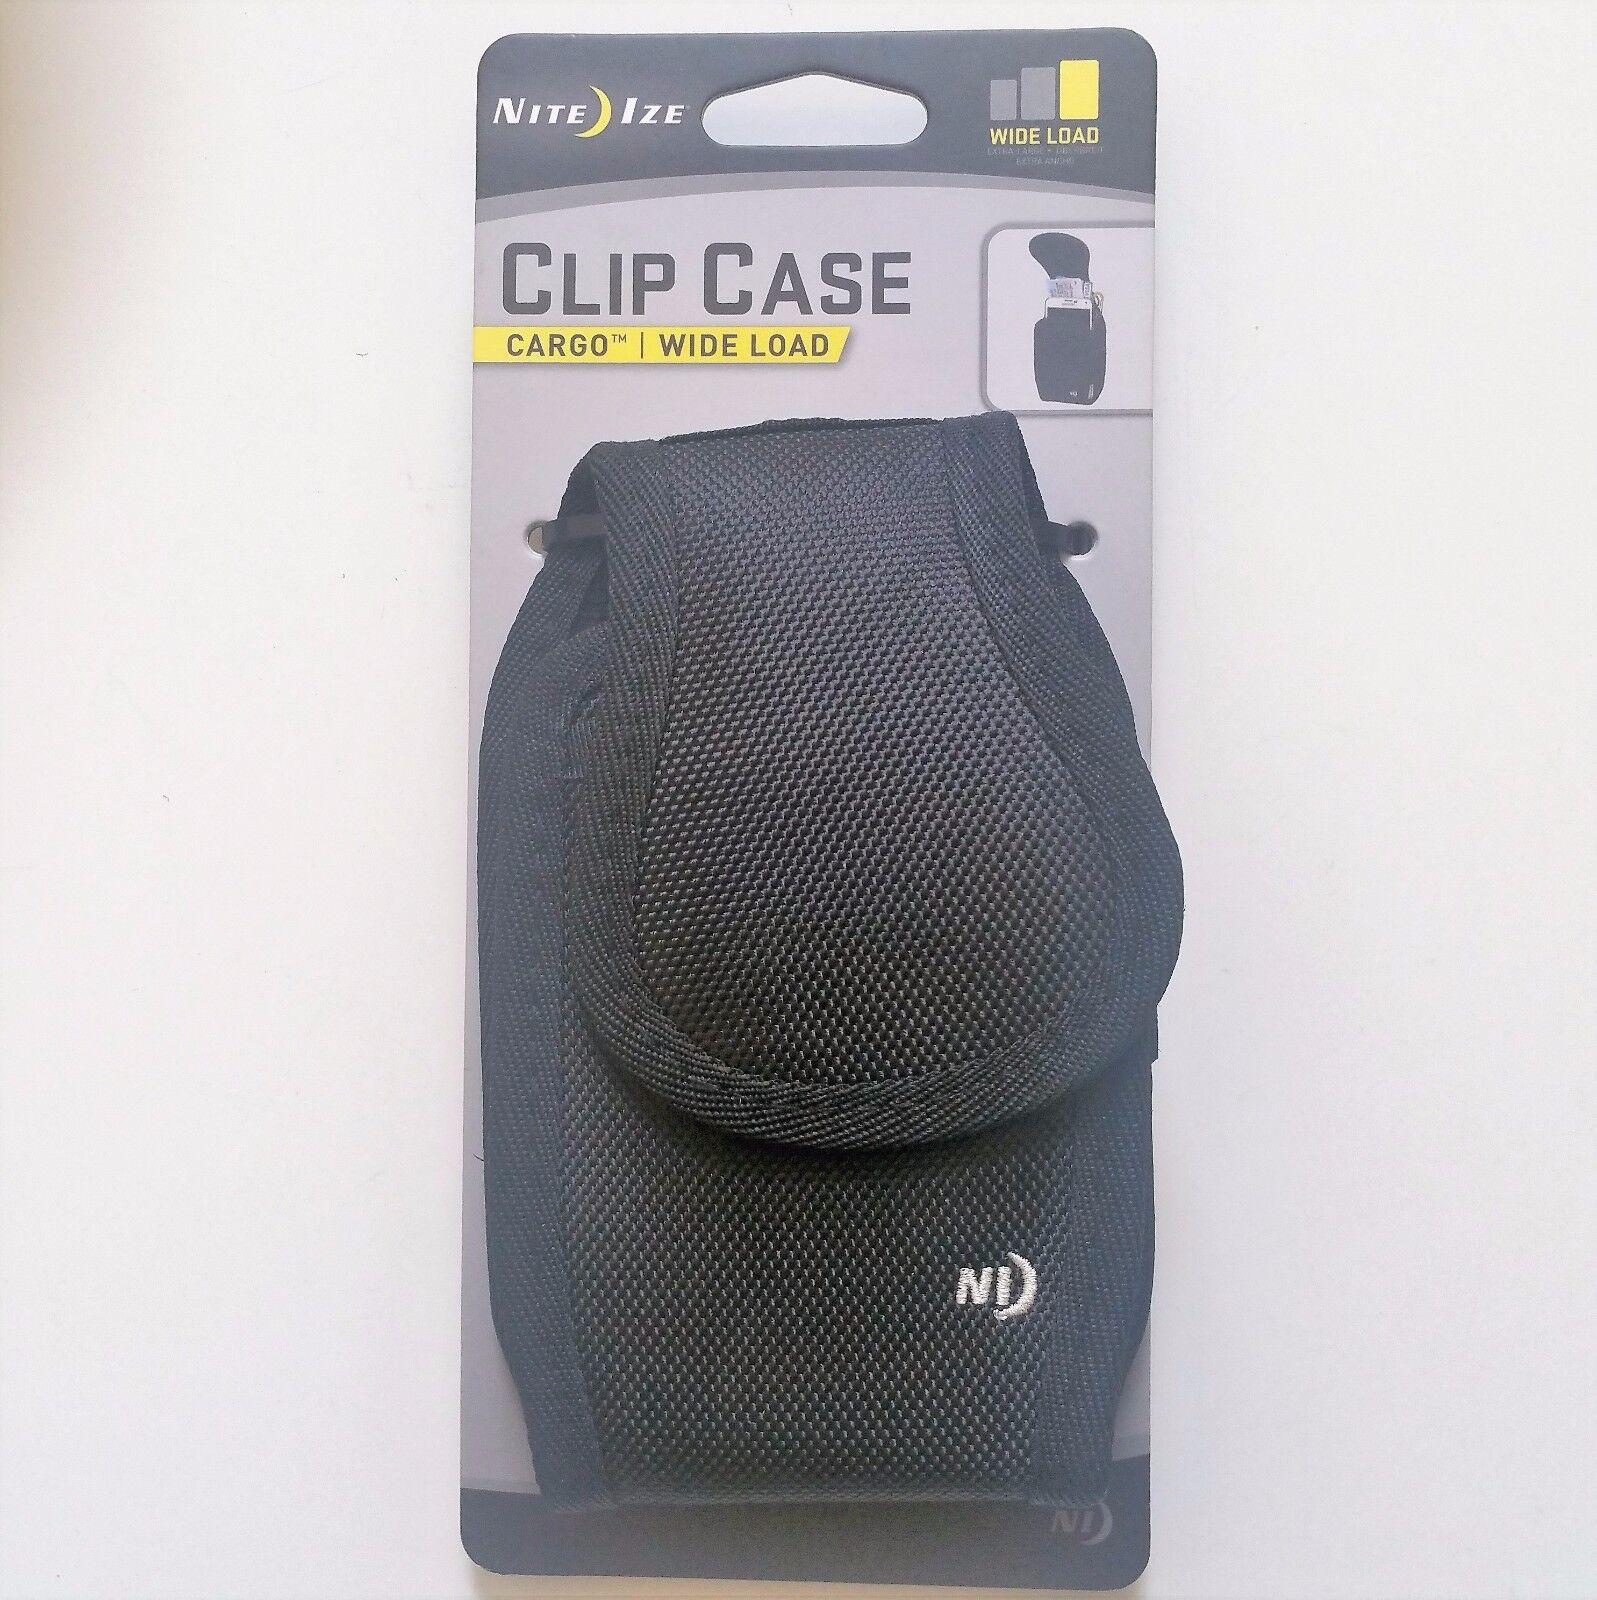 nite-ize-clip-case-cargo-cell-phone-holder-w-holster-belt-clip-wideload-blk-new